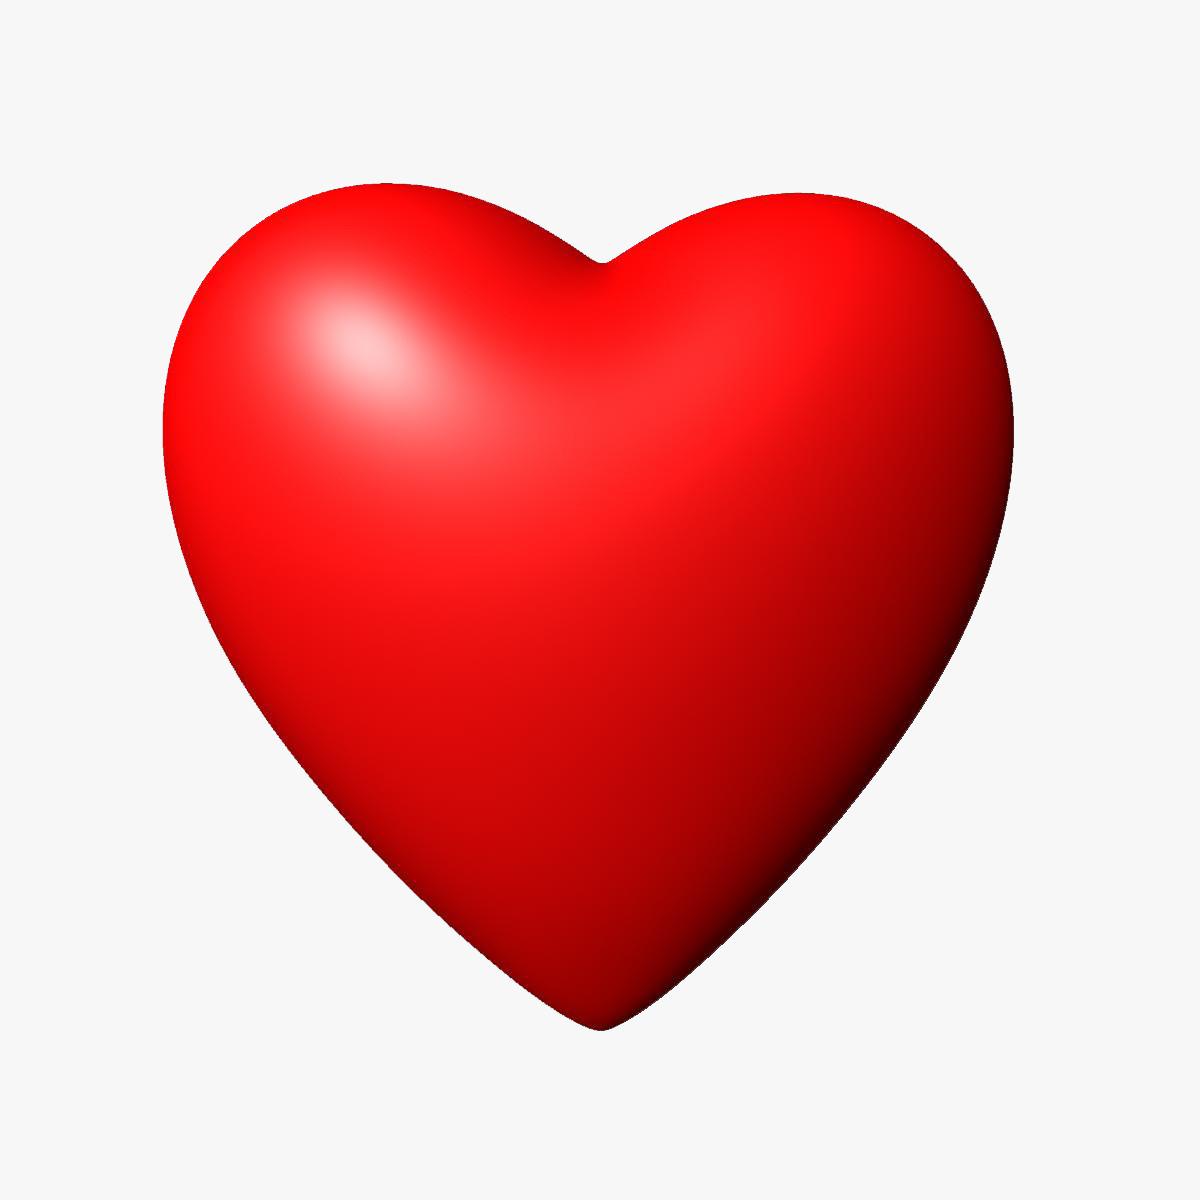 Heart_01.jpge500abf0-59e9-4248-a566-4c557069608dOriginal